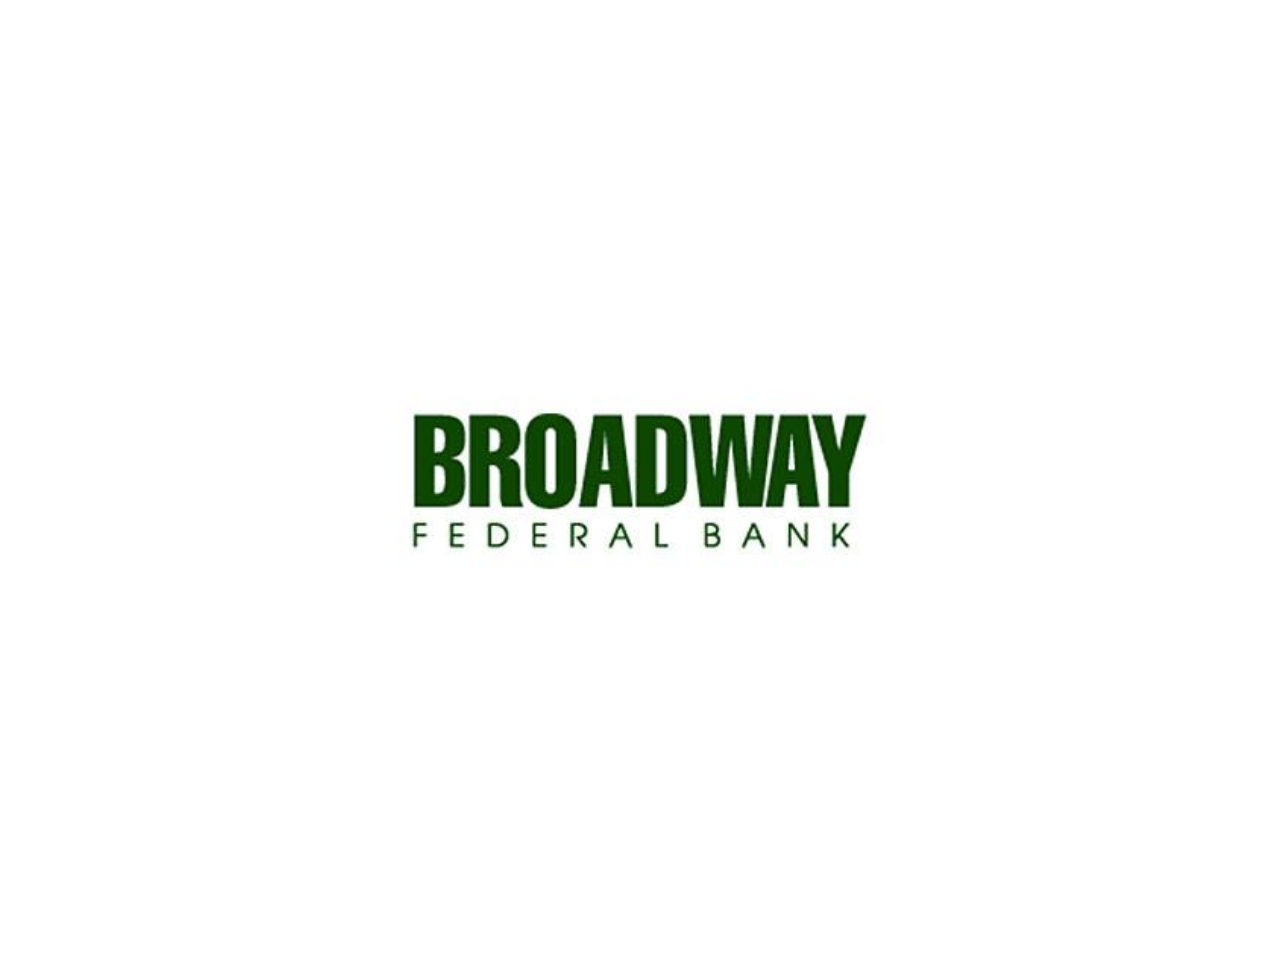 Broadway Federal Bank